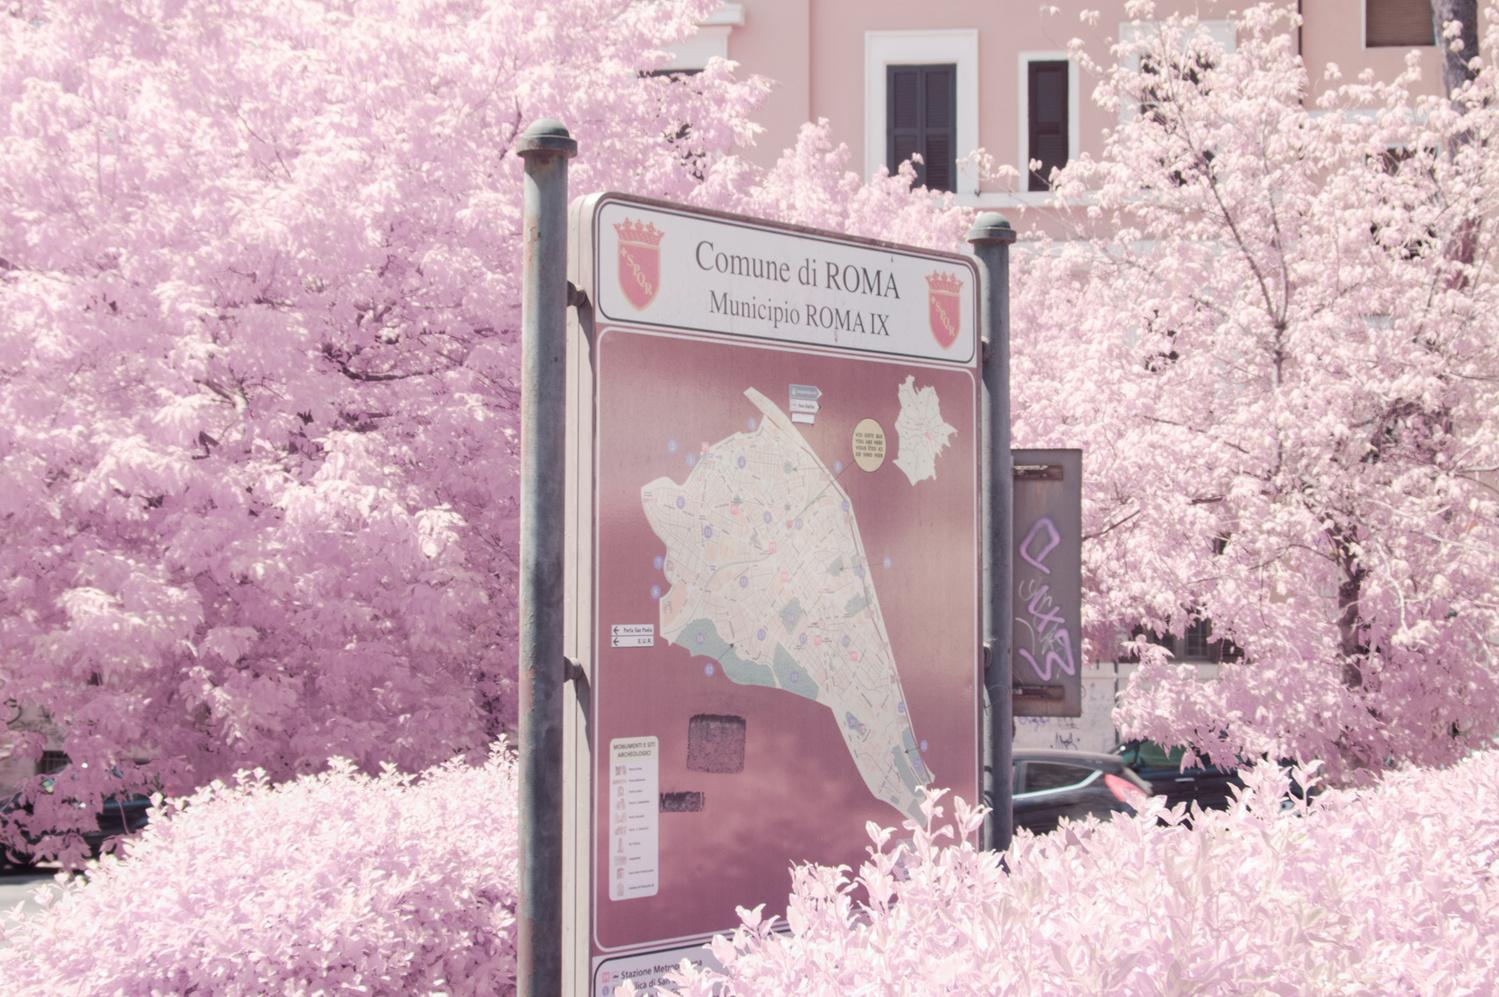 municipality of rome infrared